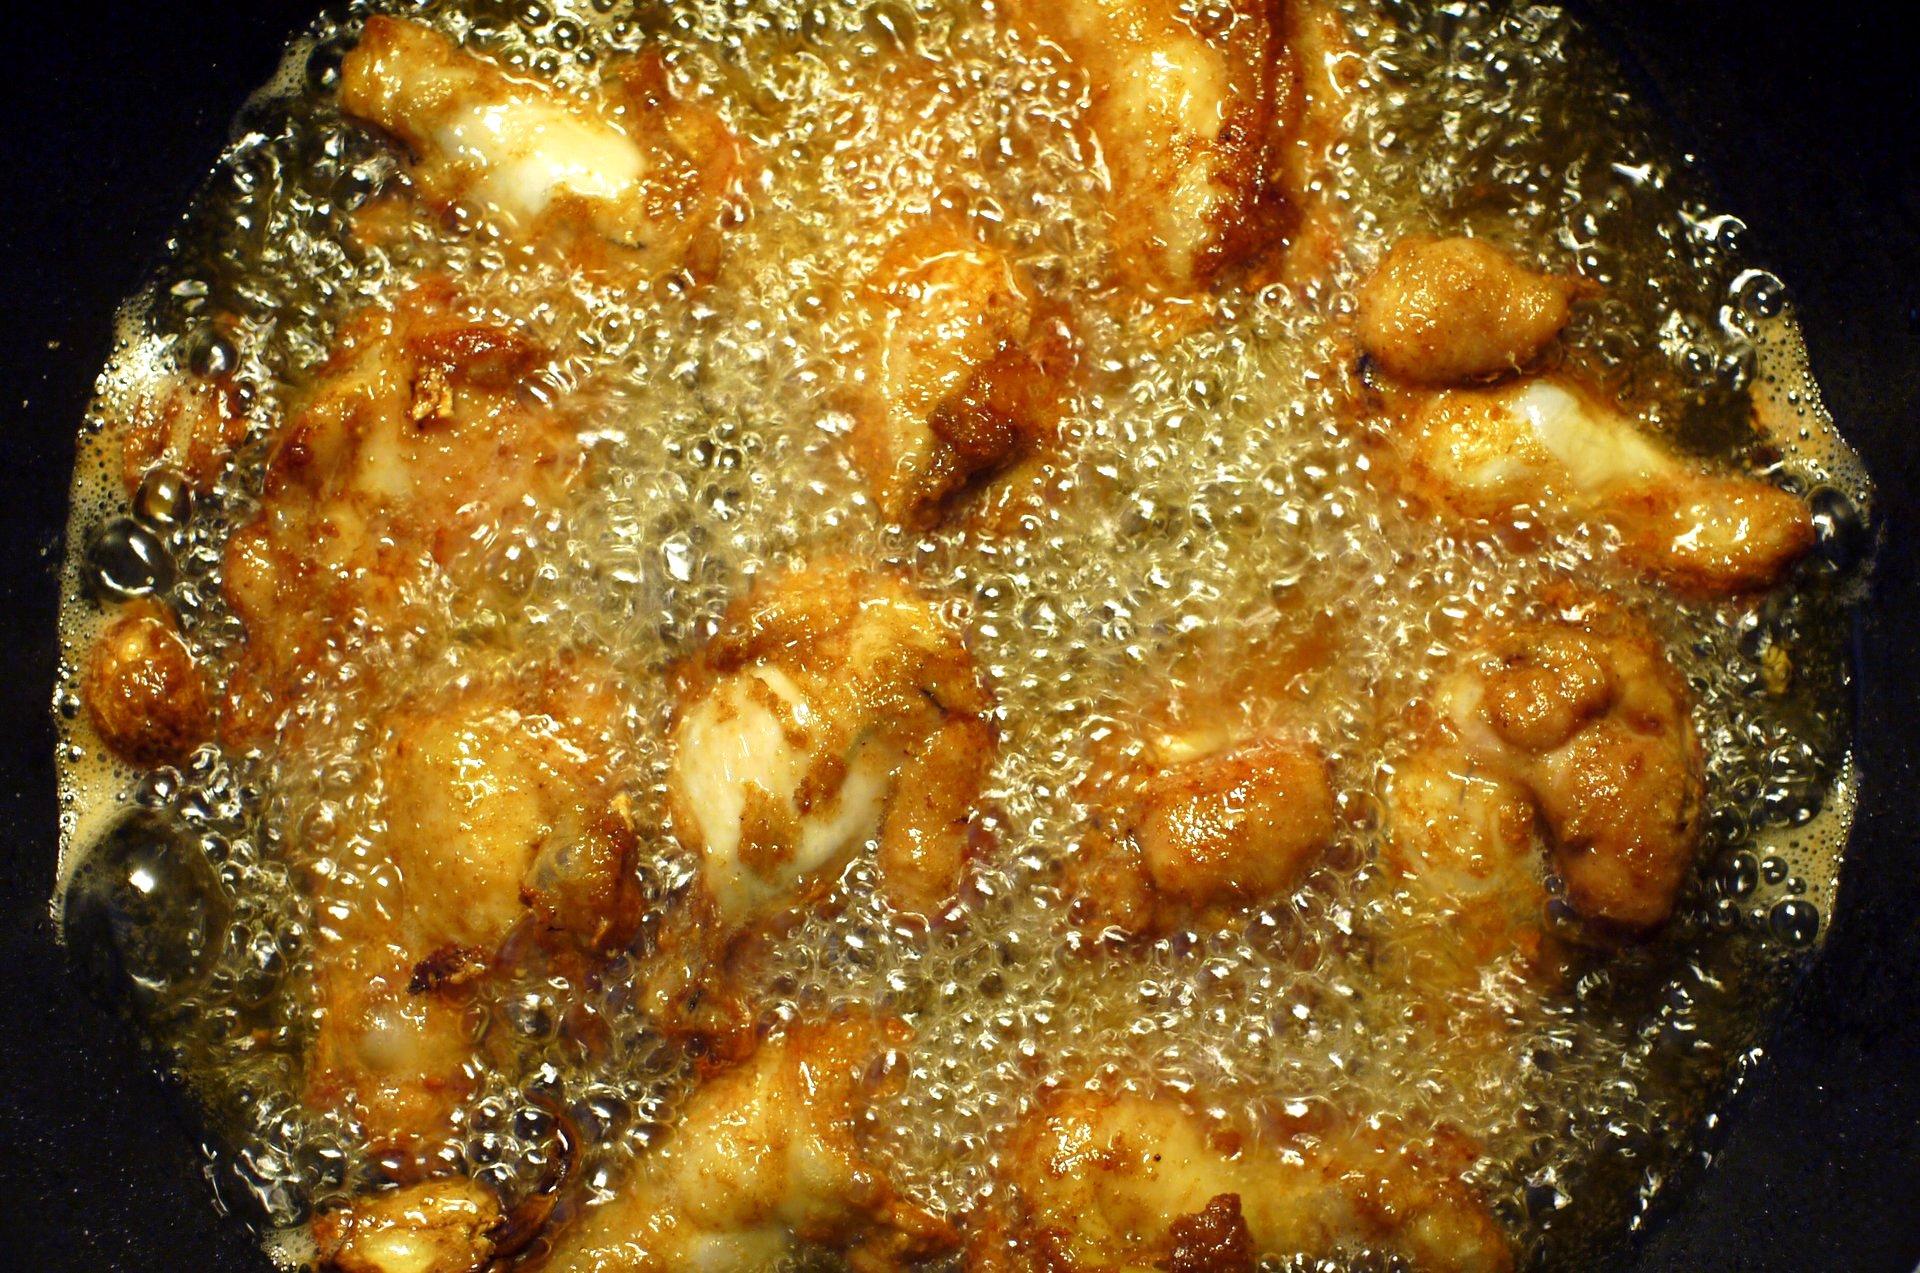 File:Deep frying chicken upper wing.JPG - Wikipedia, the free ...